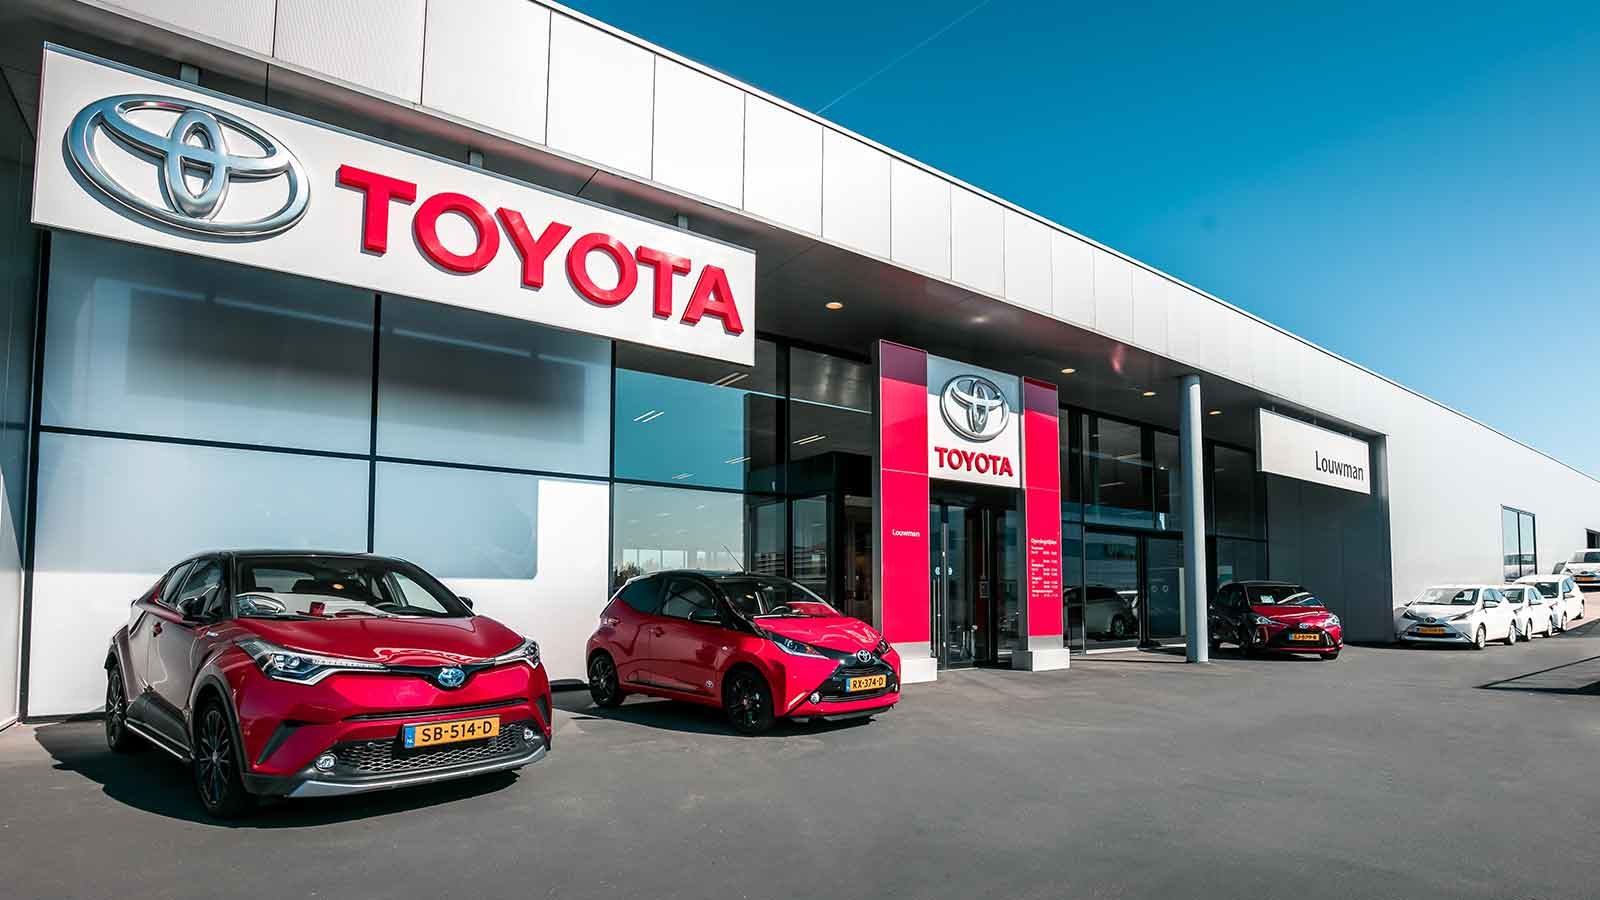 Louwman Toyota Den Haag